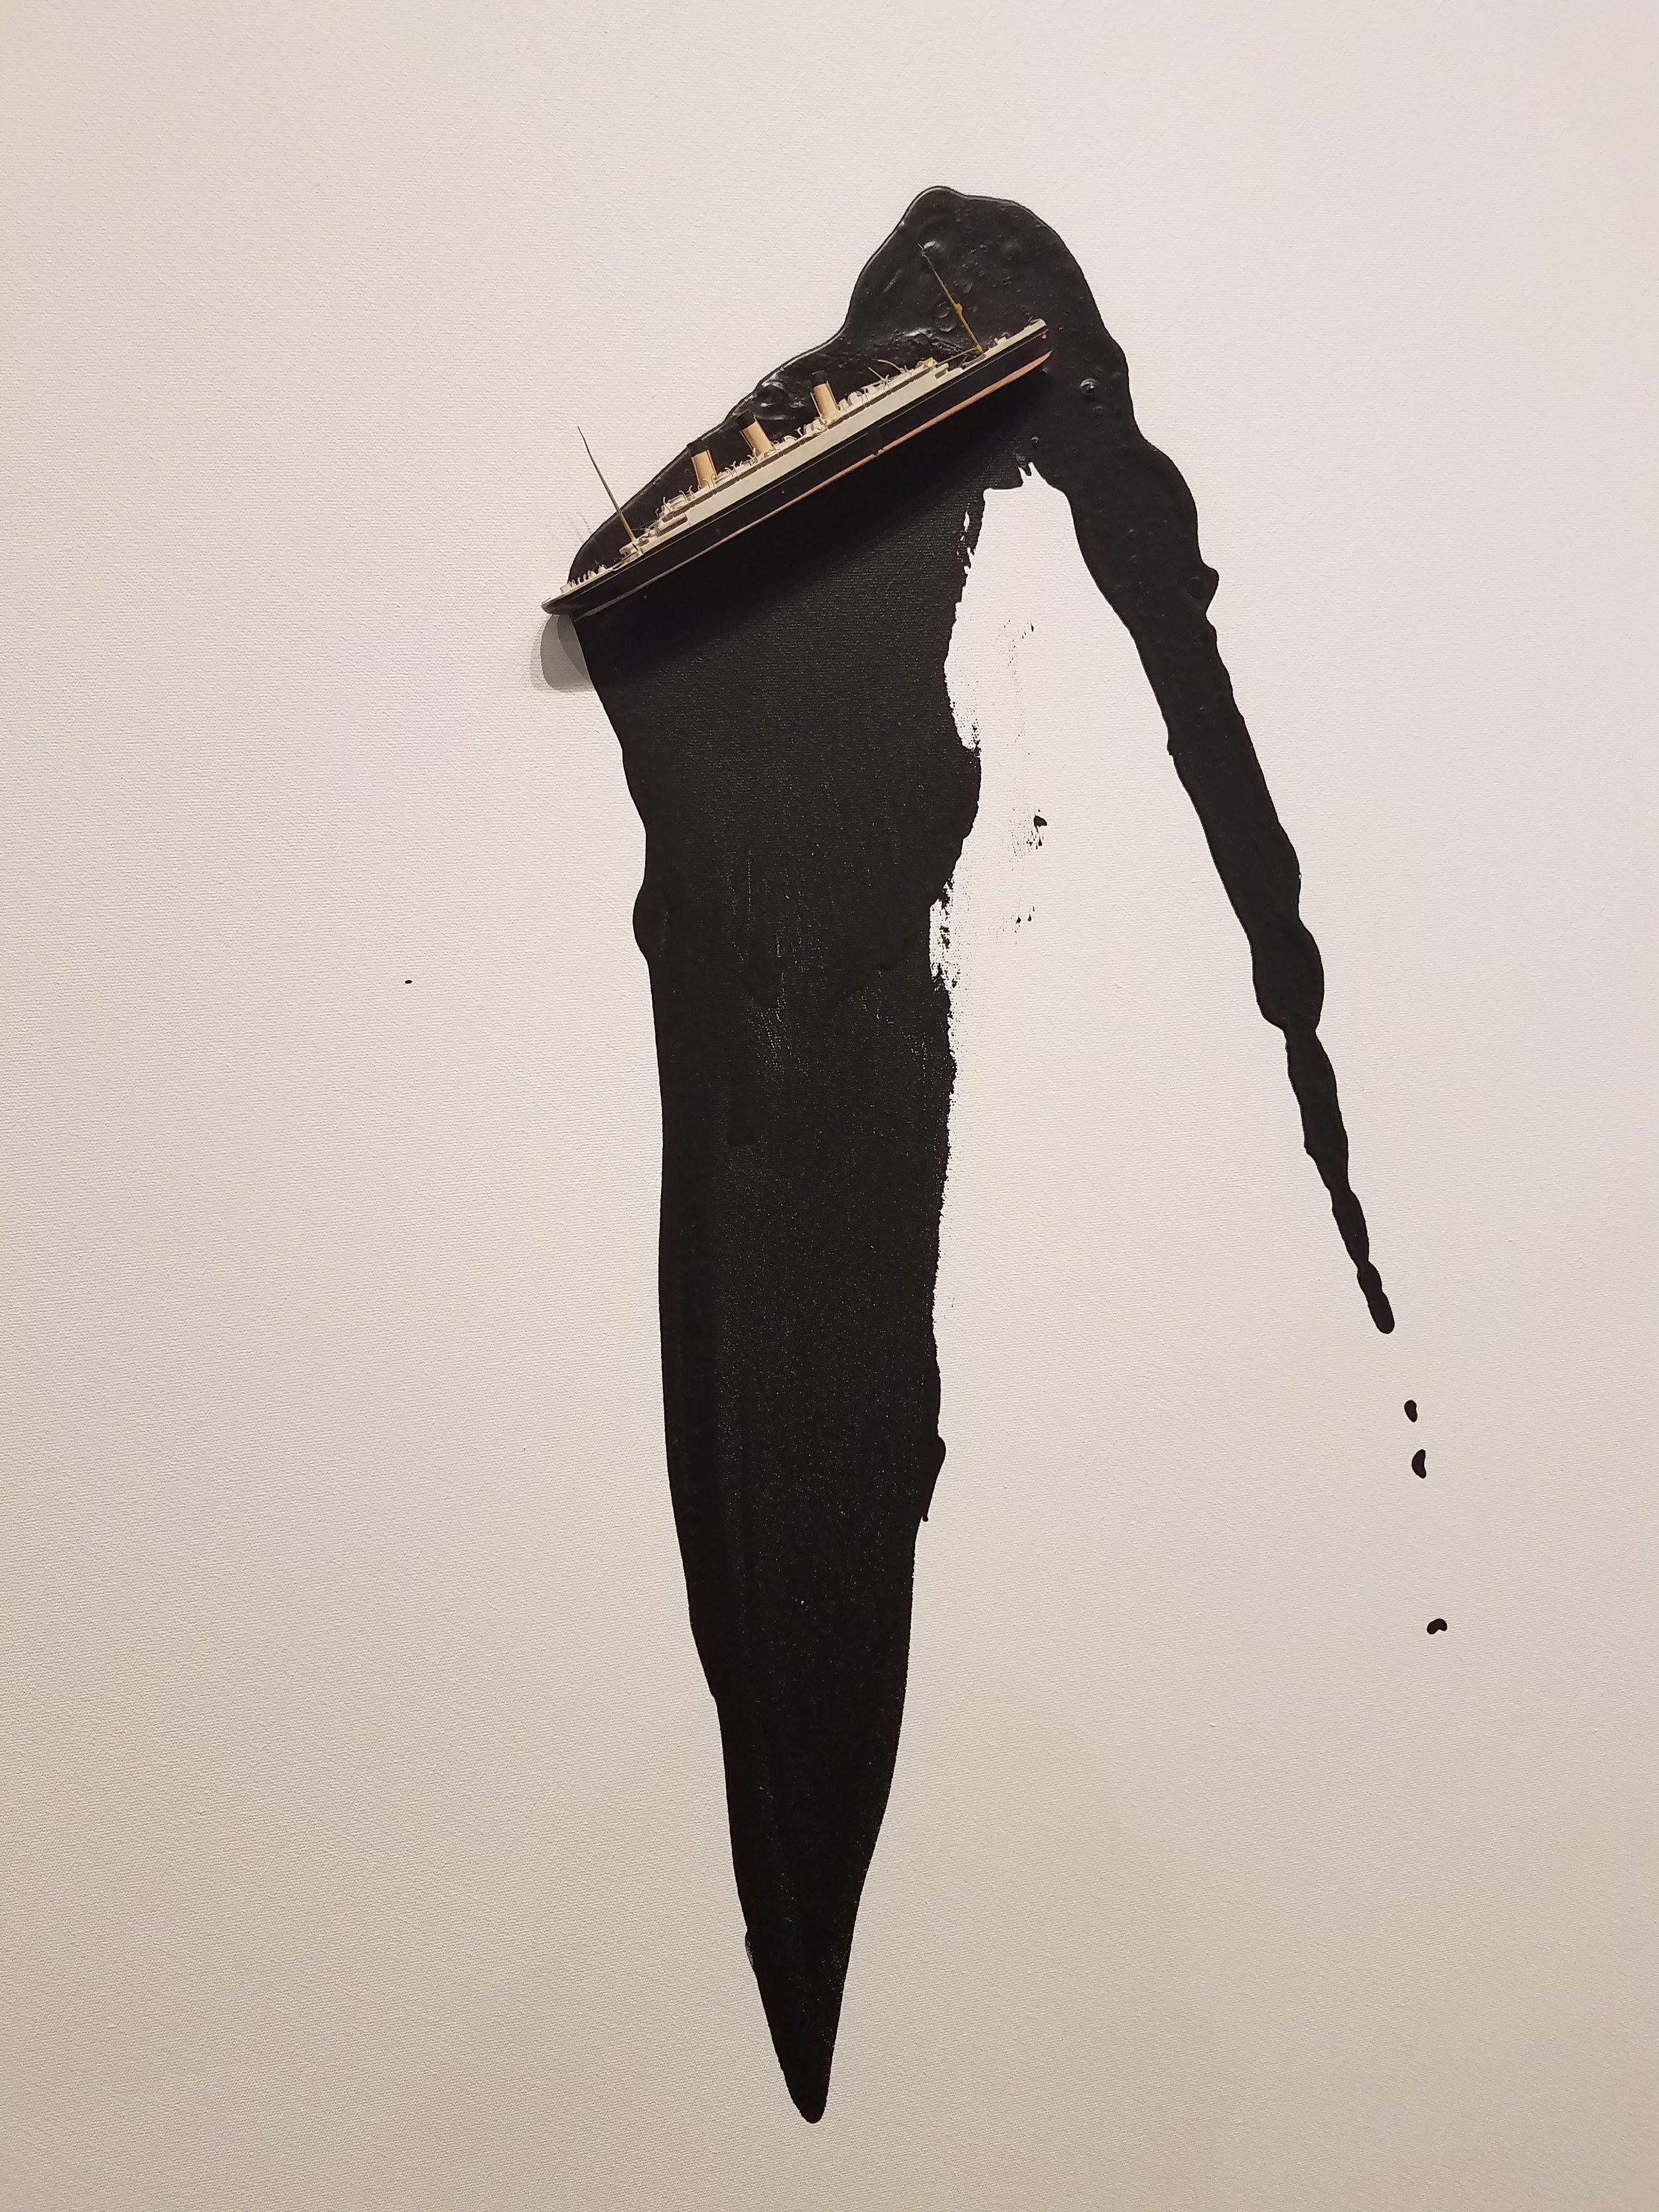 Liliana Porter, Untitled (Ship), 2011 (Detail)